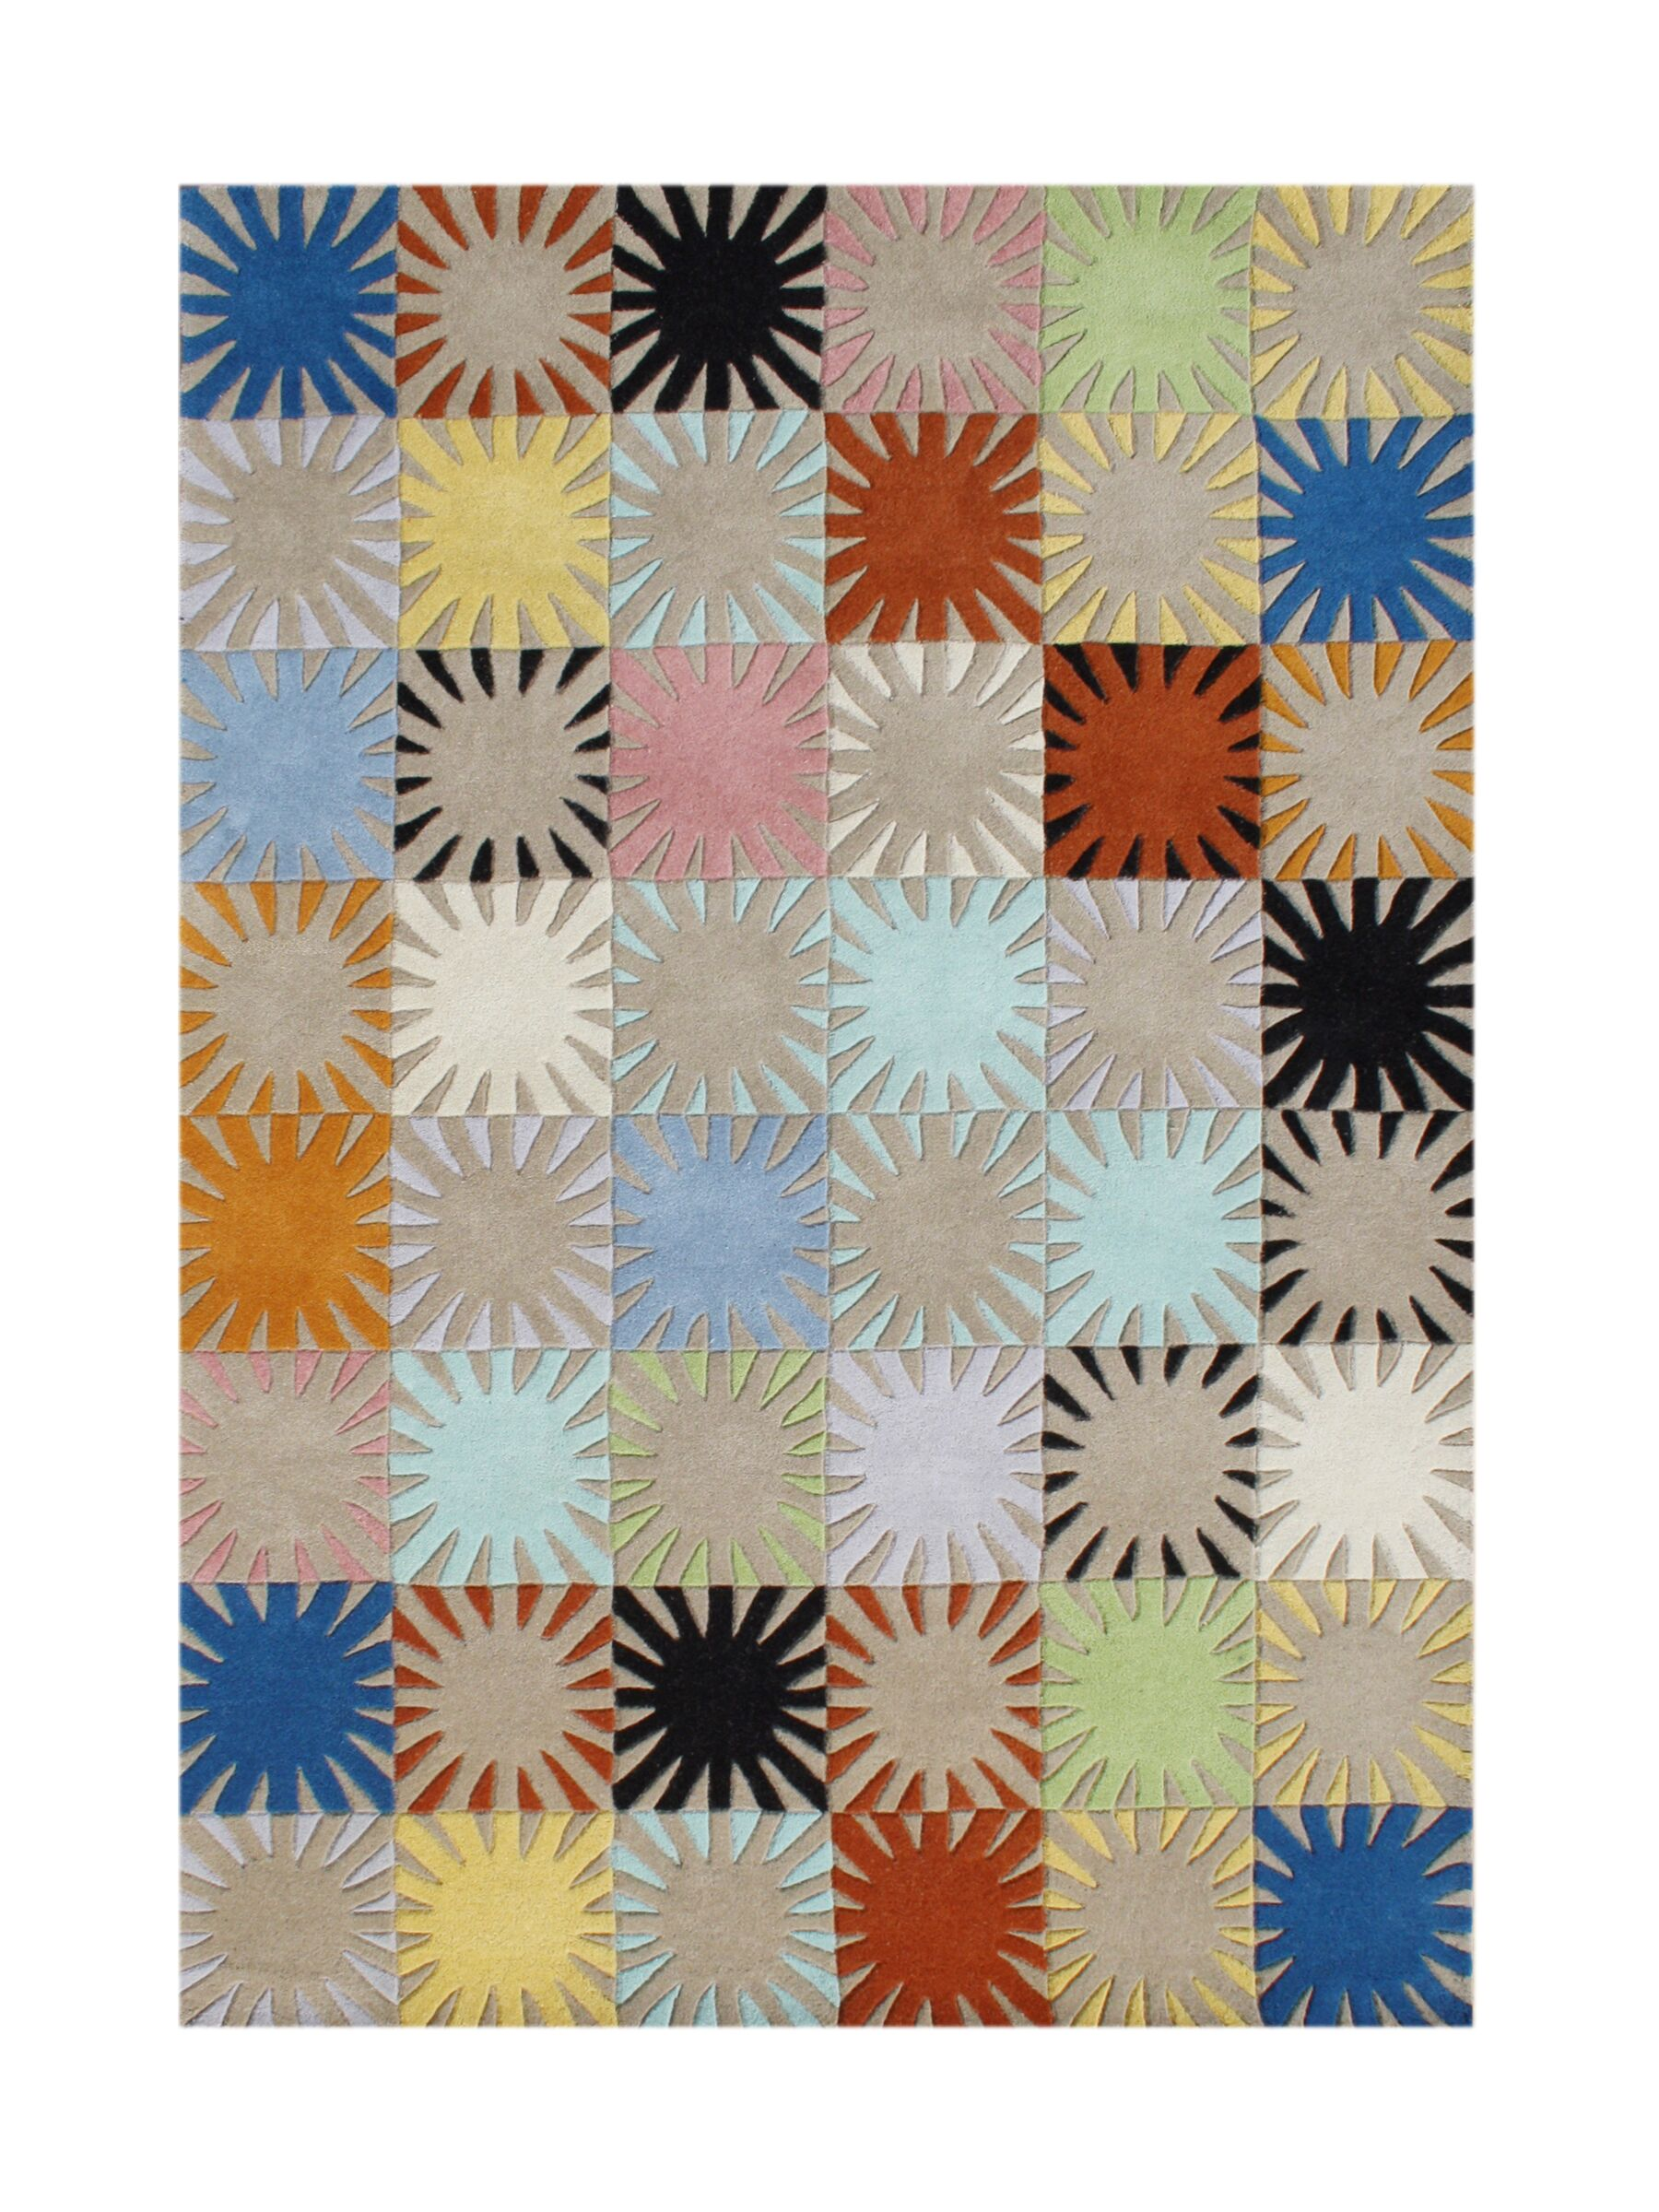 Lark Hand-Tufted Area Rug Rug Size: 5' x 8'